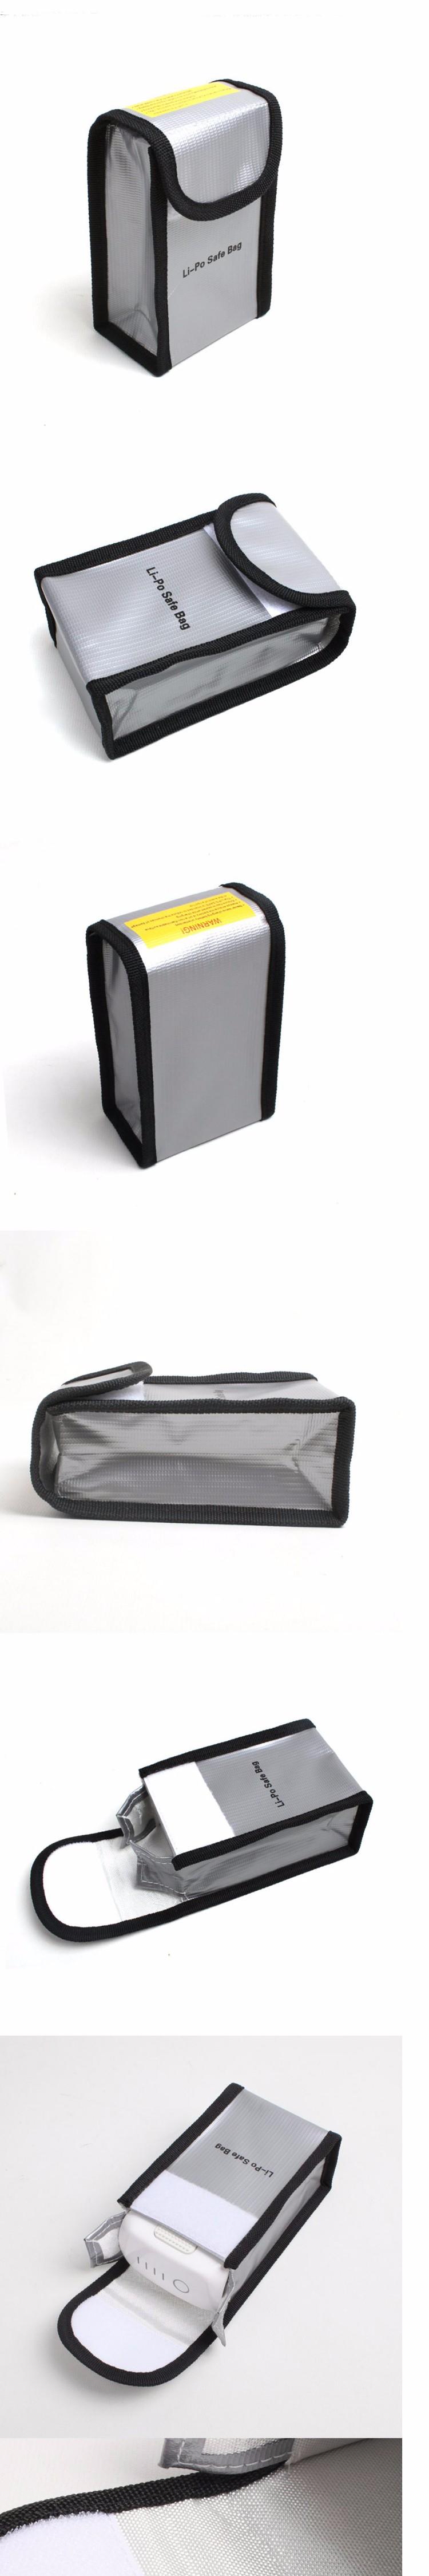 Dji phantom 3 Battery Explosion proof Li-po safe bag dji phantom 4 Professional accessories battery parts rc diy drone kit